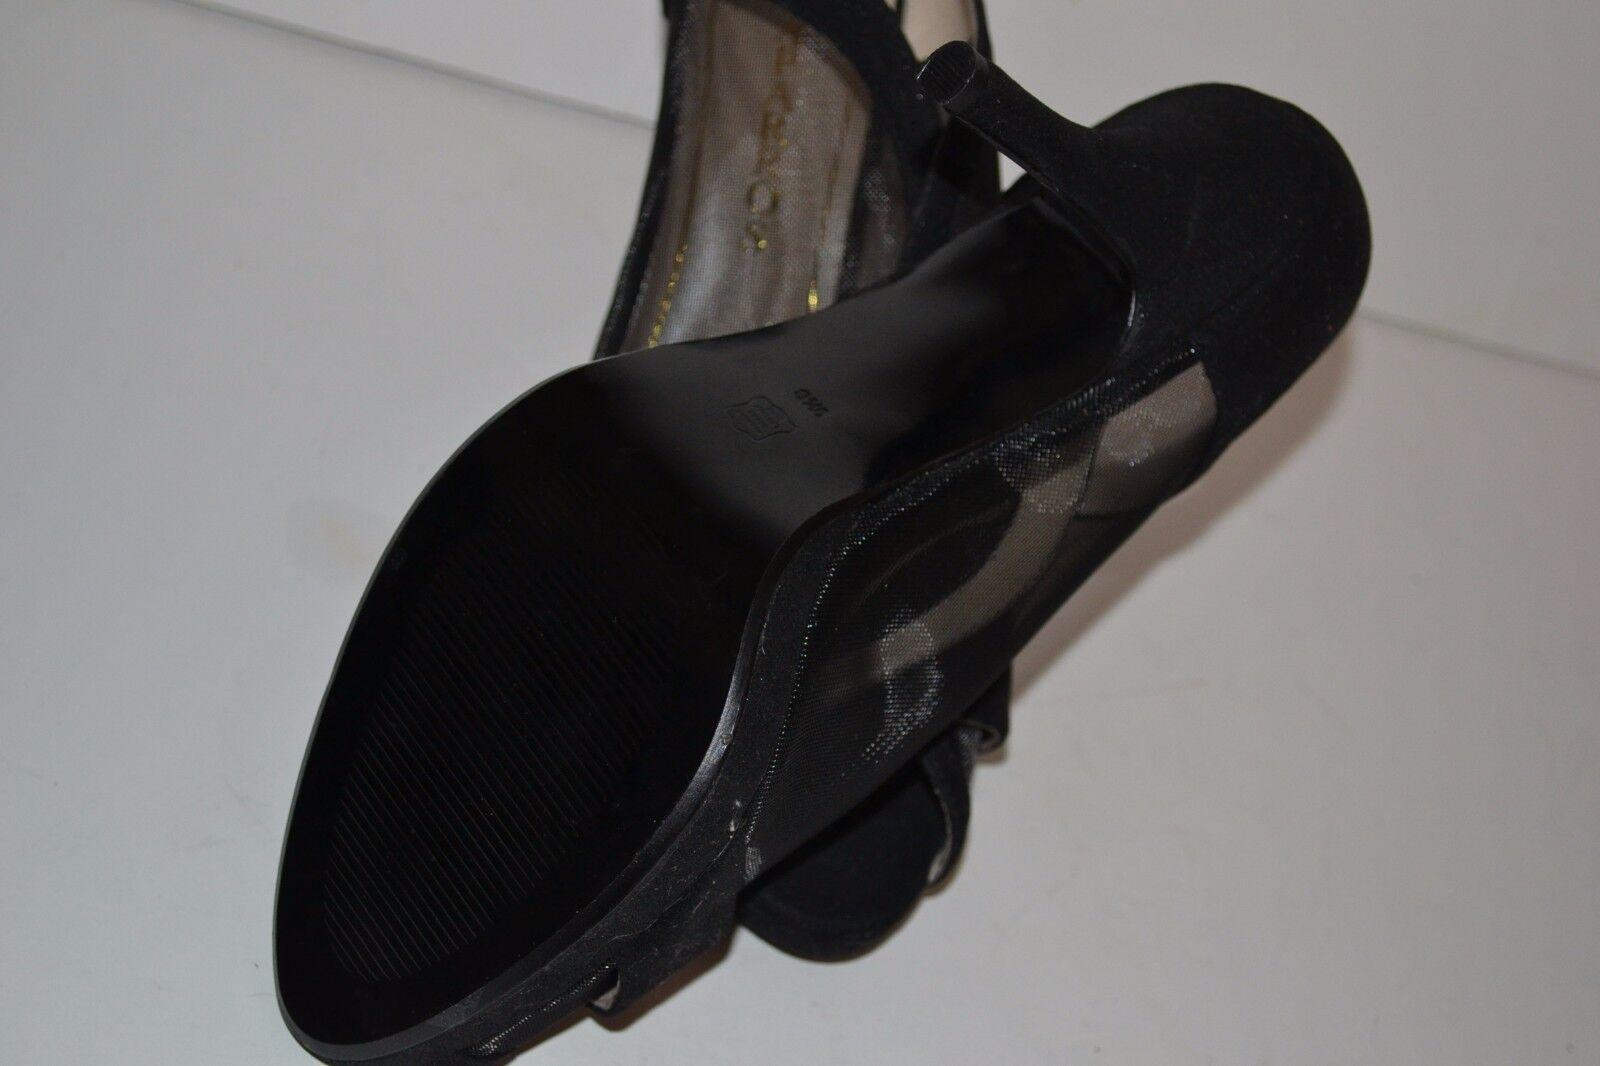 Caparros Neville Para Gamuza Cuero Para Neville Mujer Malla Negra Puntera abierta Tacones Talla 9.5 M Nuevo 0ed762